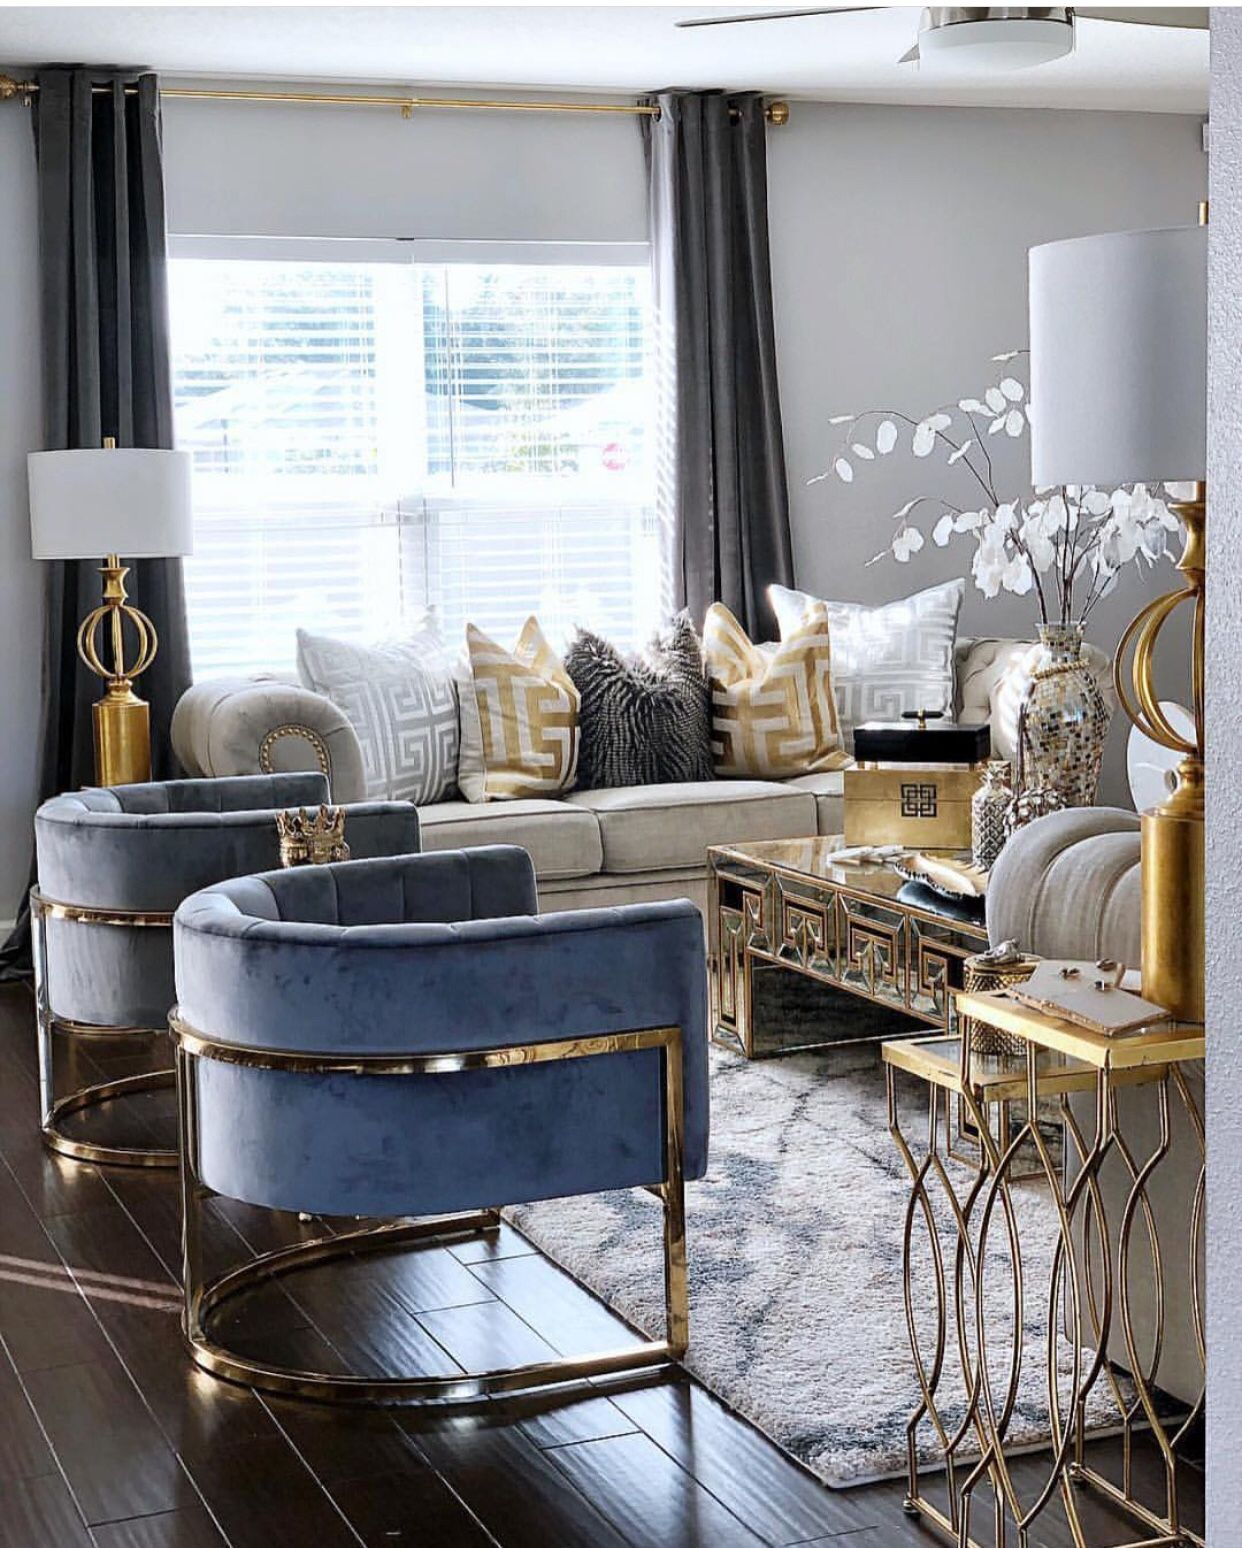 Pin By Debra Vanburen On Home Decor Ideas In 2020 Luxury Living